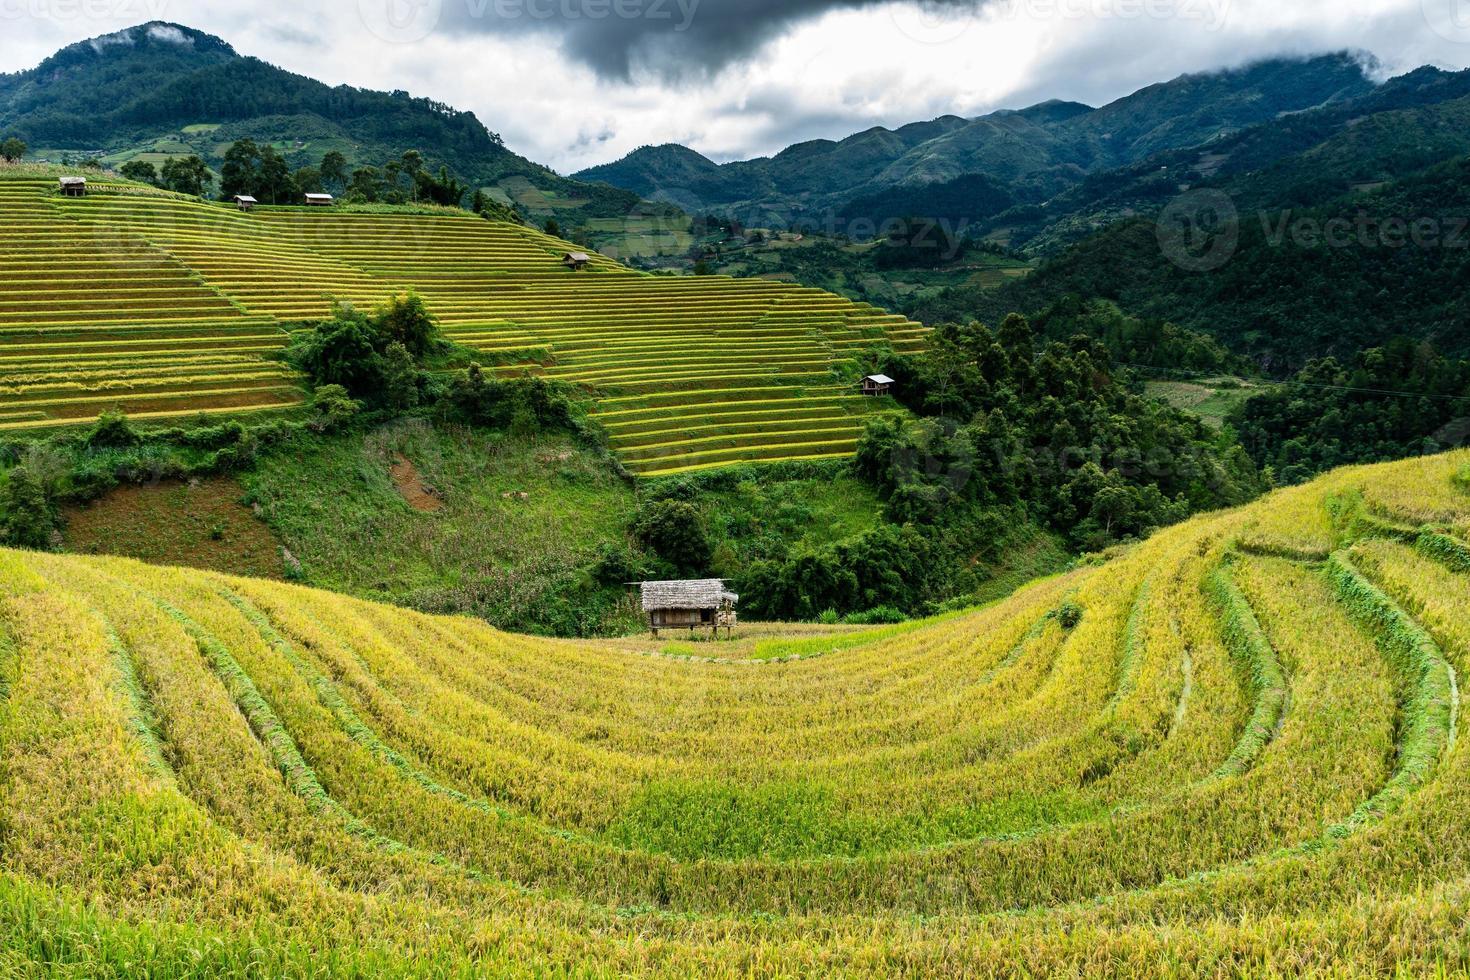 gyllene terrasser fält i norra Vietnam foto